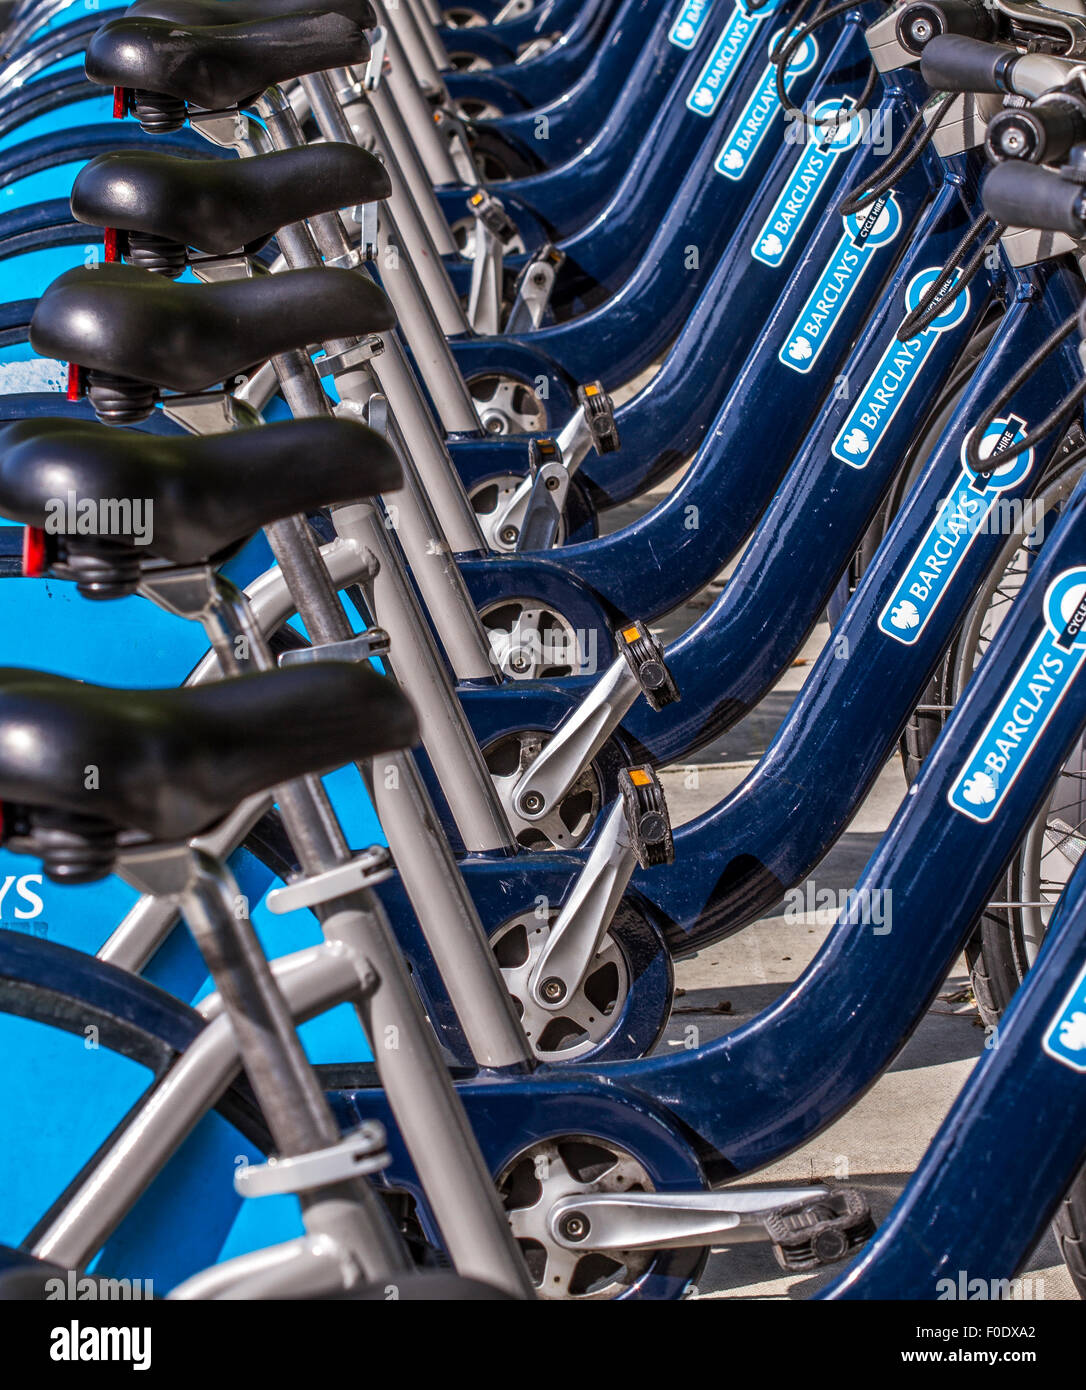 Boris Bikes racked up  In London - Stock Image